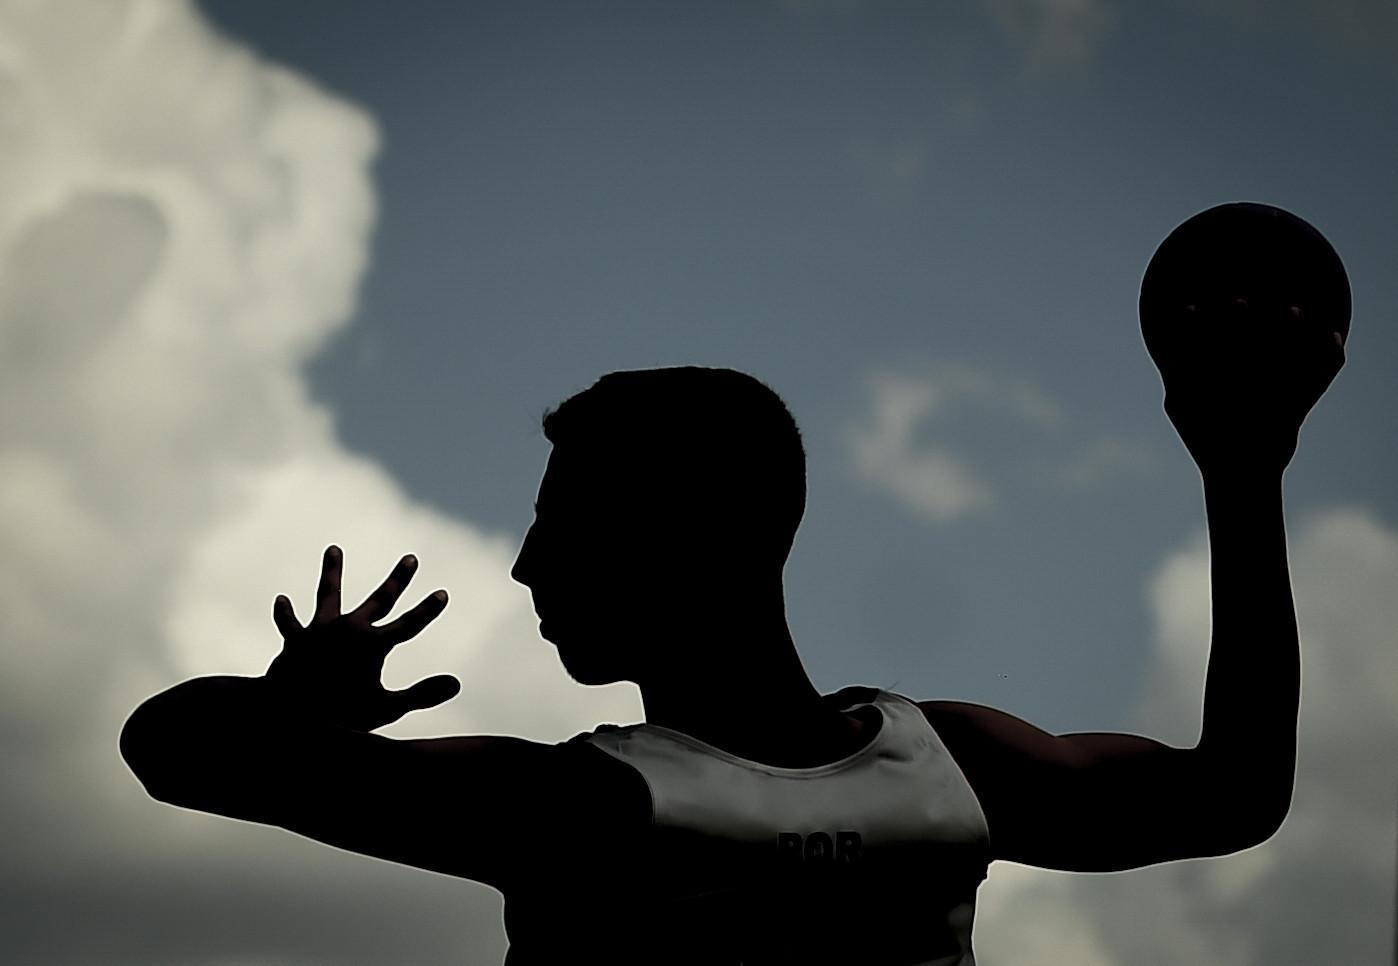 Danish men make perfect start at European Beach Handball Championships